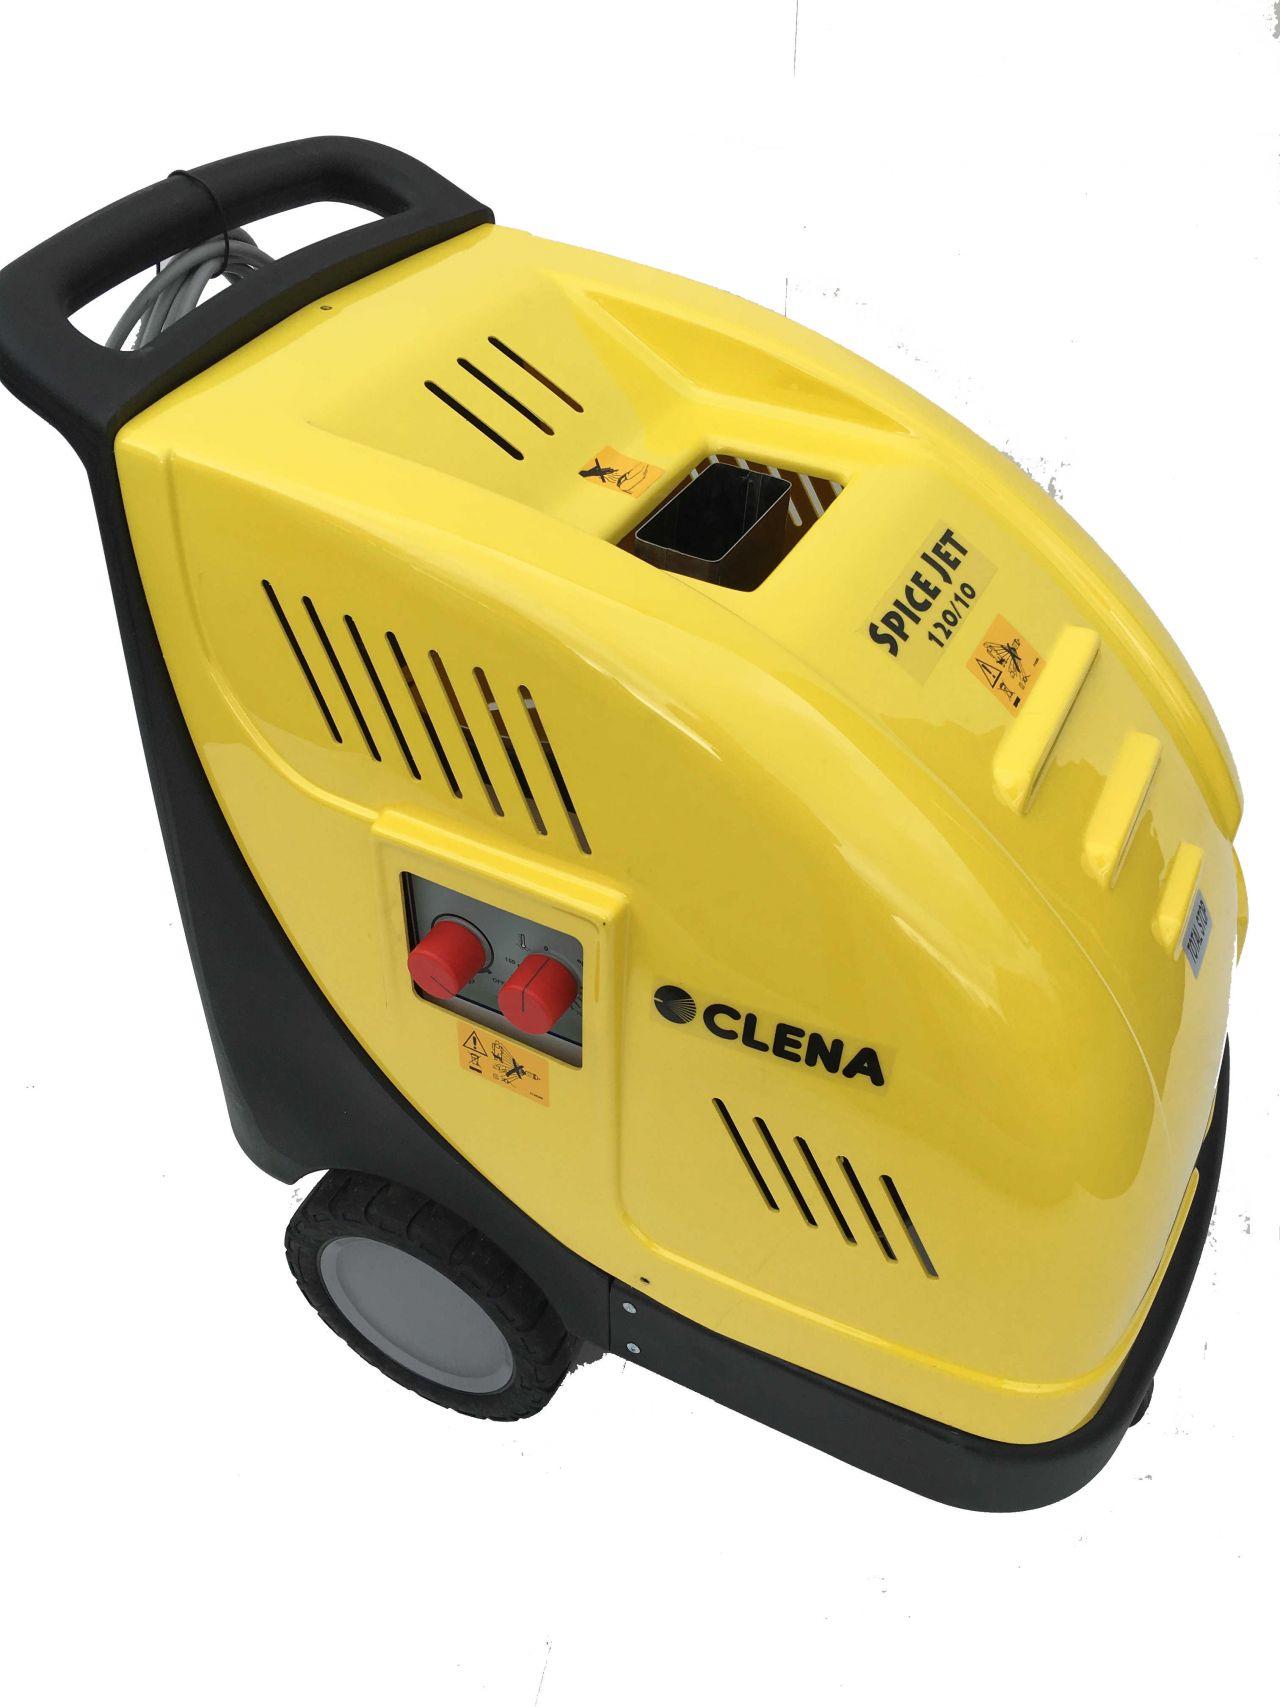 220V - Clena warmwater ZOMER-ACTIE 120/10